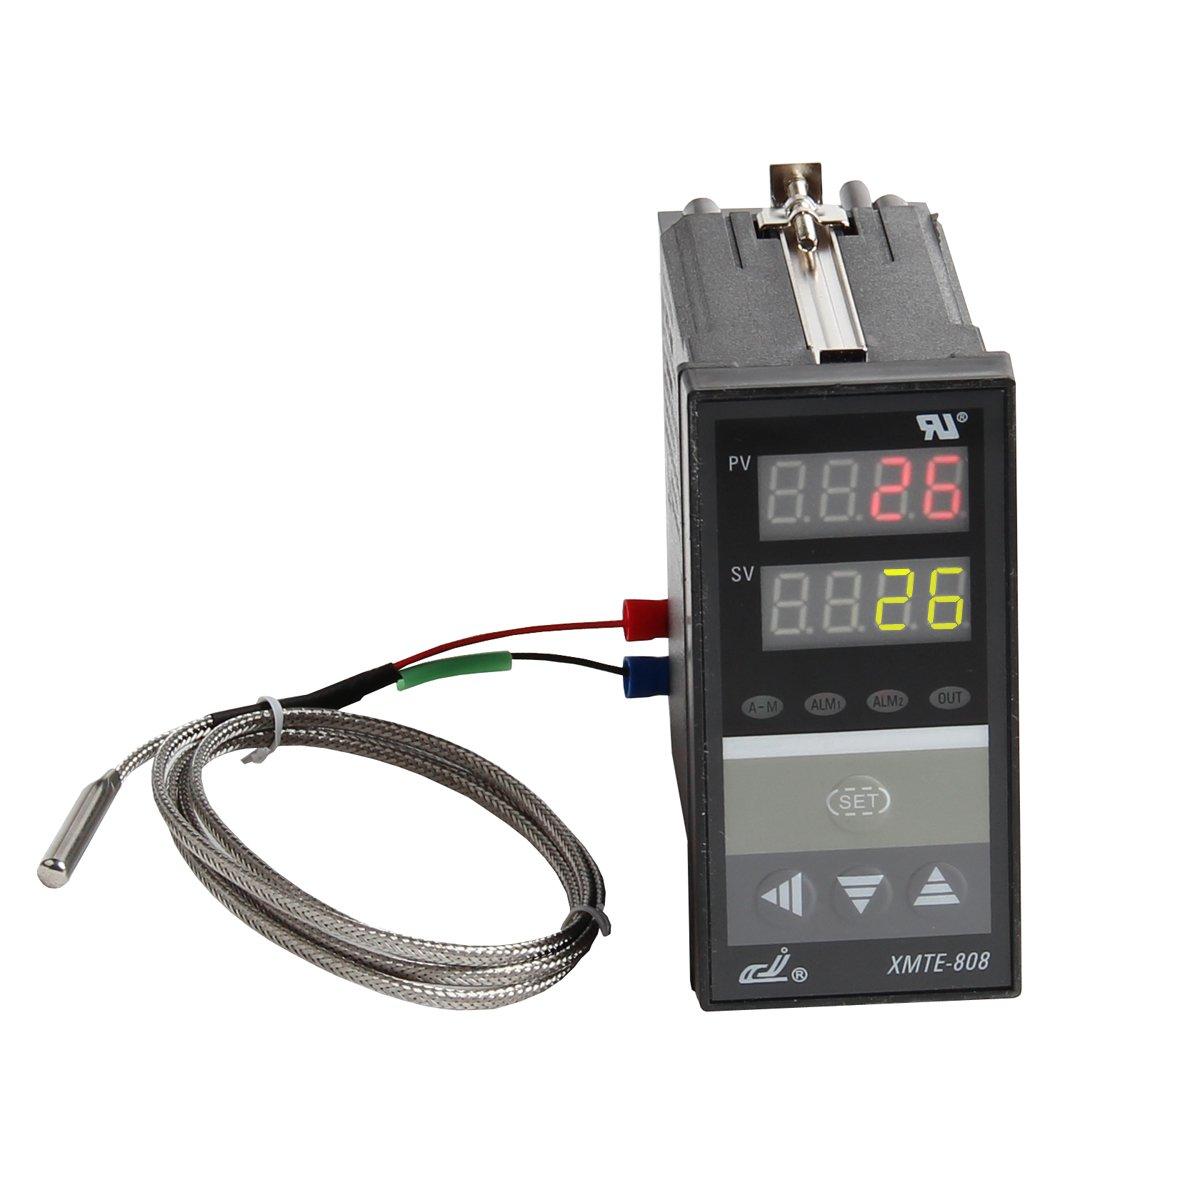 CJ XMTE-808 Relay Output Digital LED Pid Temperature Controller with K Sensor